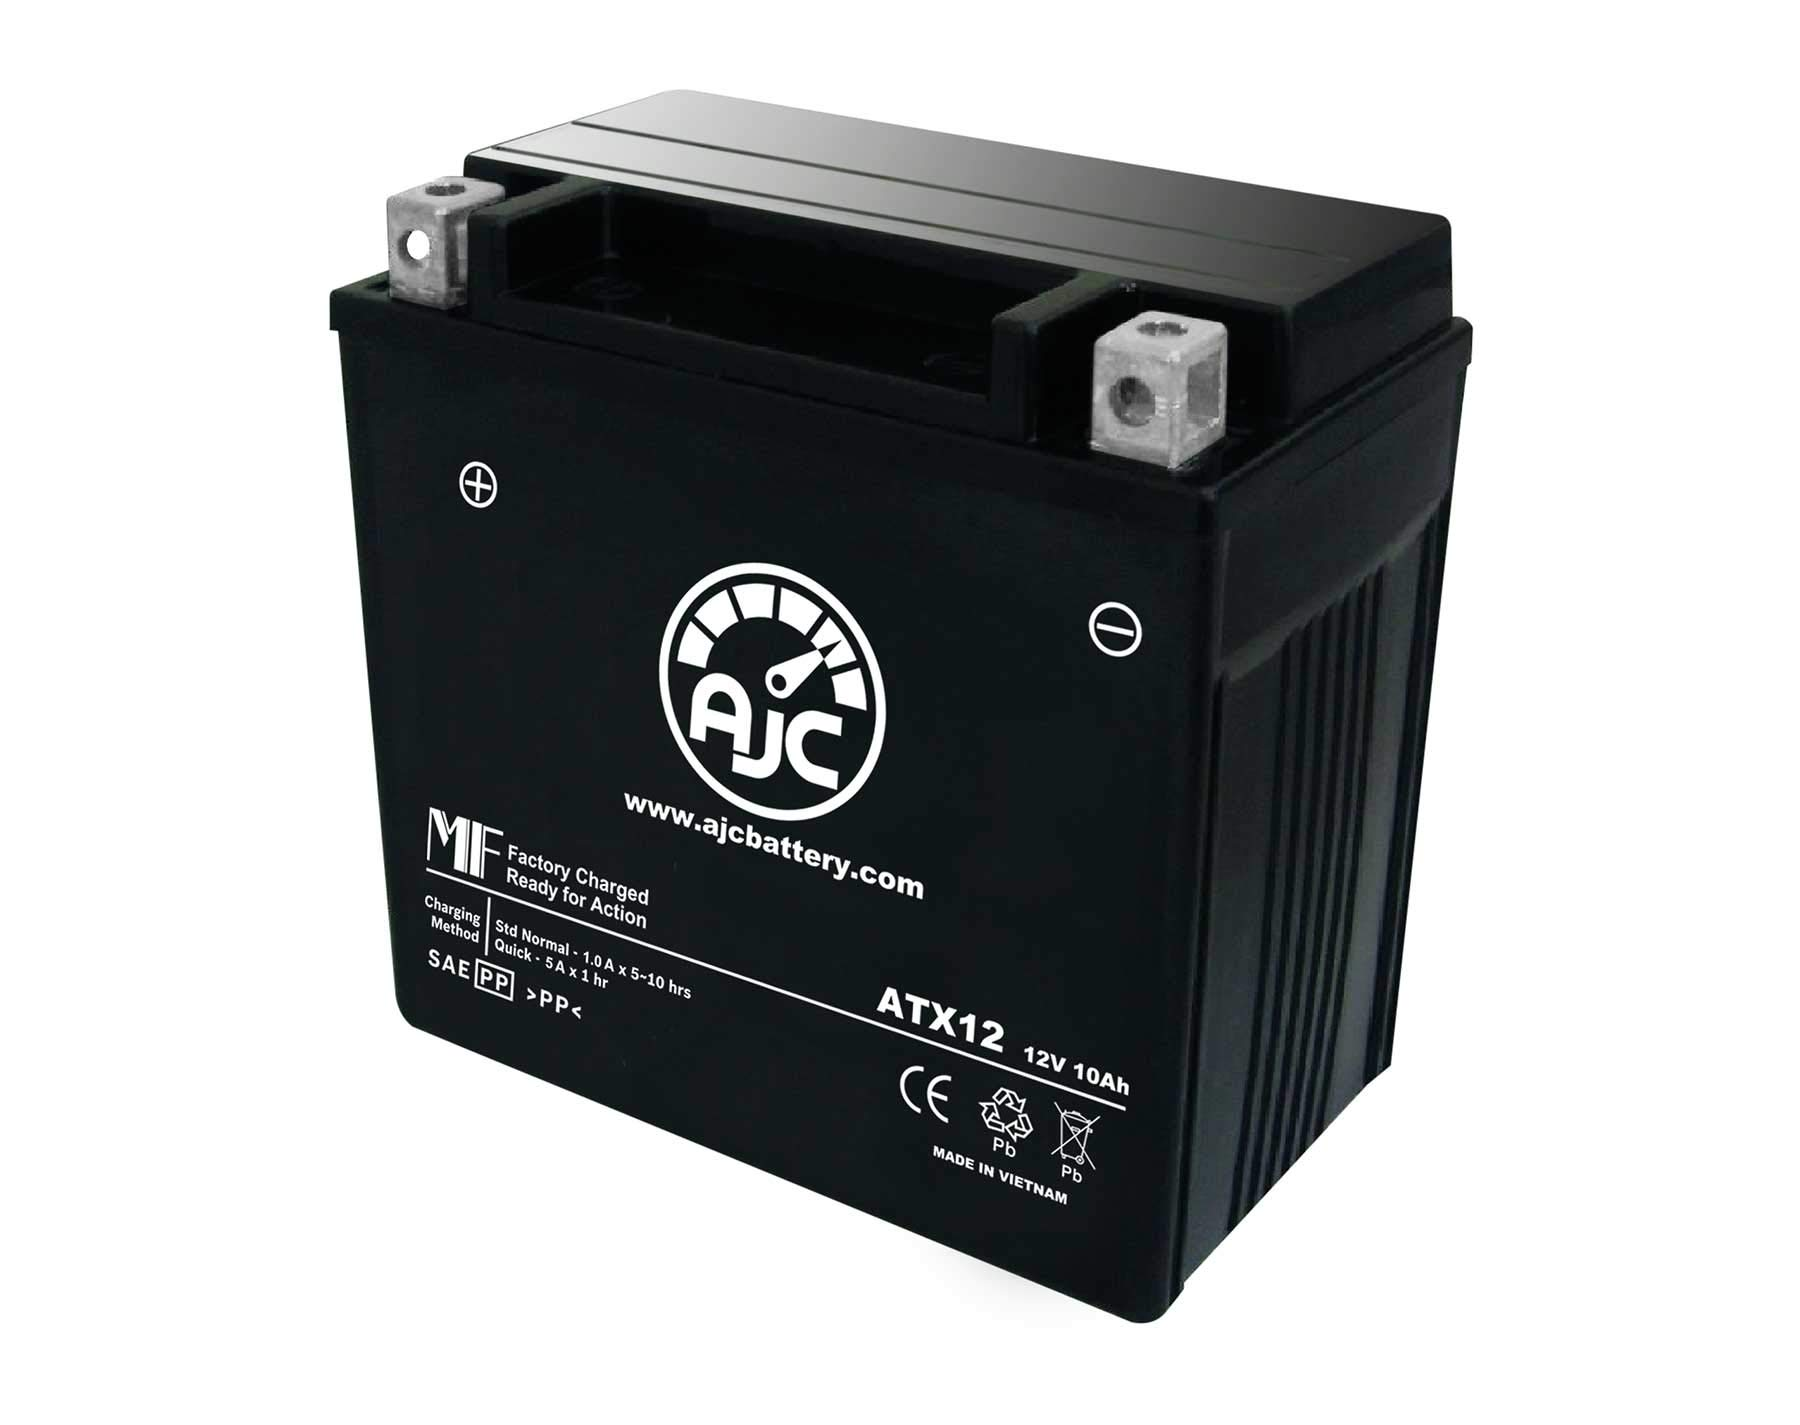 Piaggio Vespa Scooter Replacement Battery